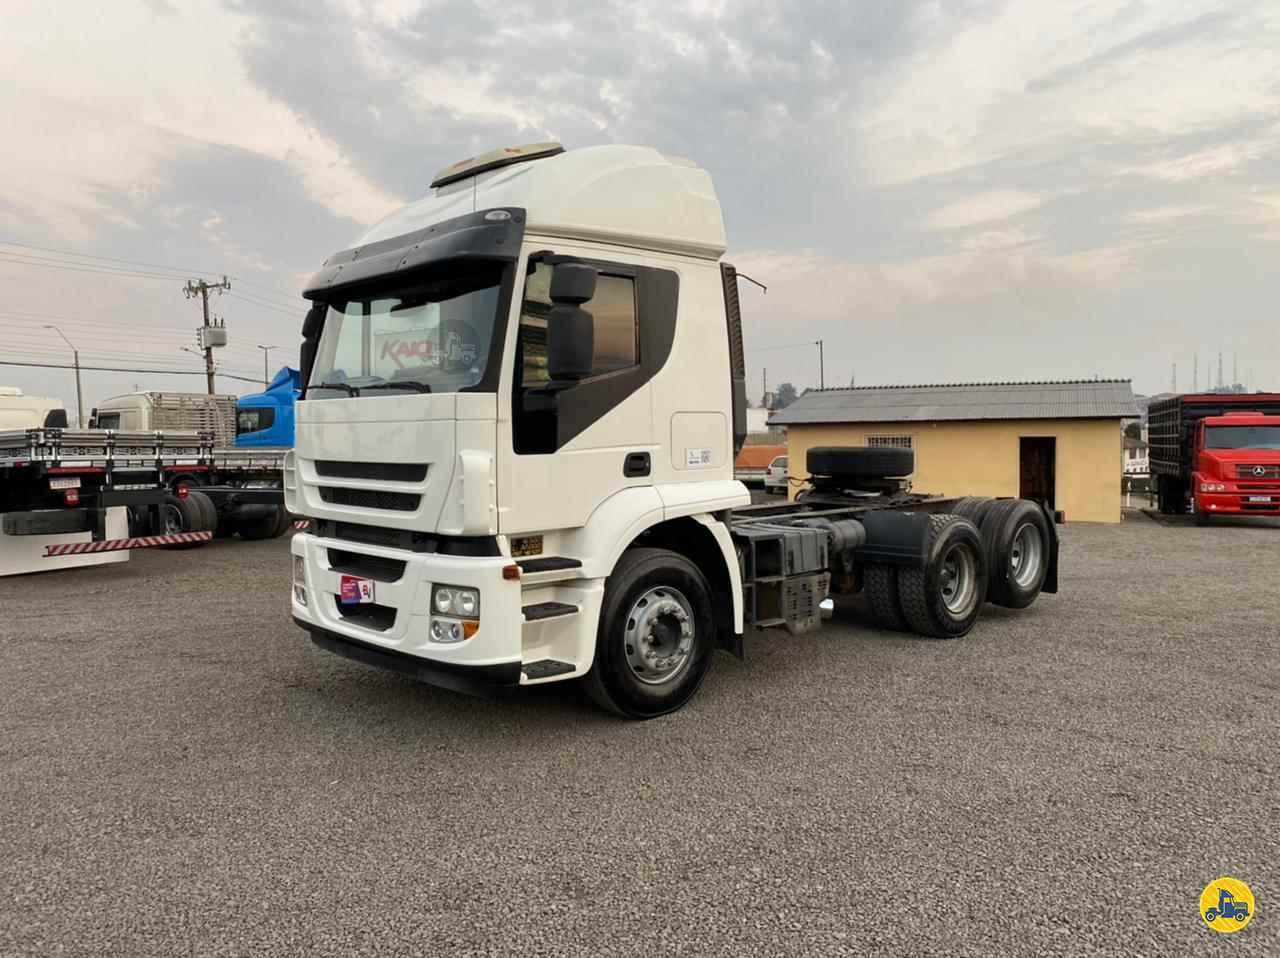 CAMINHAO IVECO STRALIS 570 Chassis Truck 6x2 Kaio Caminhões LAGES SANTA CATARINA SC